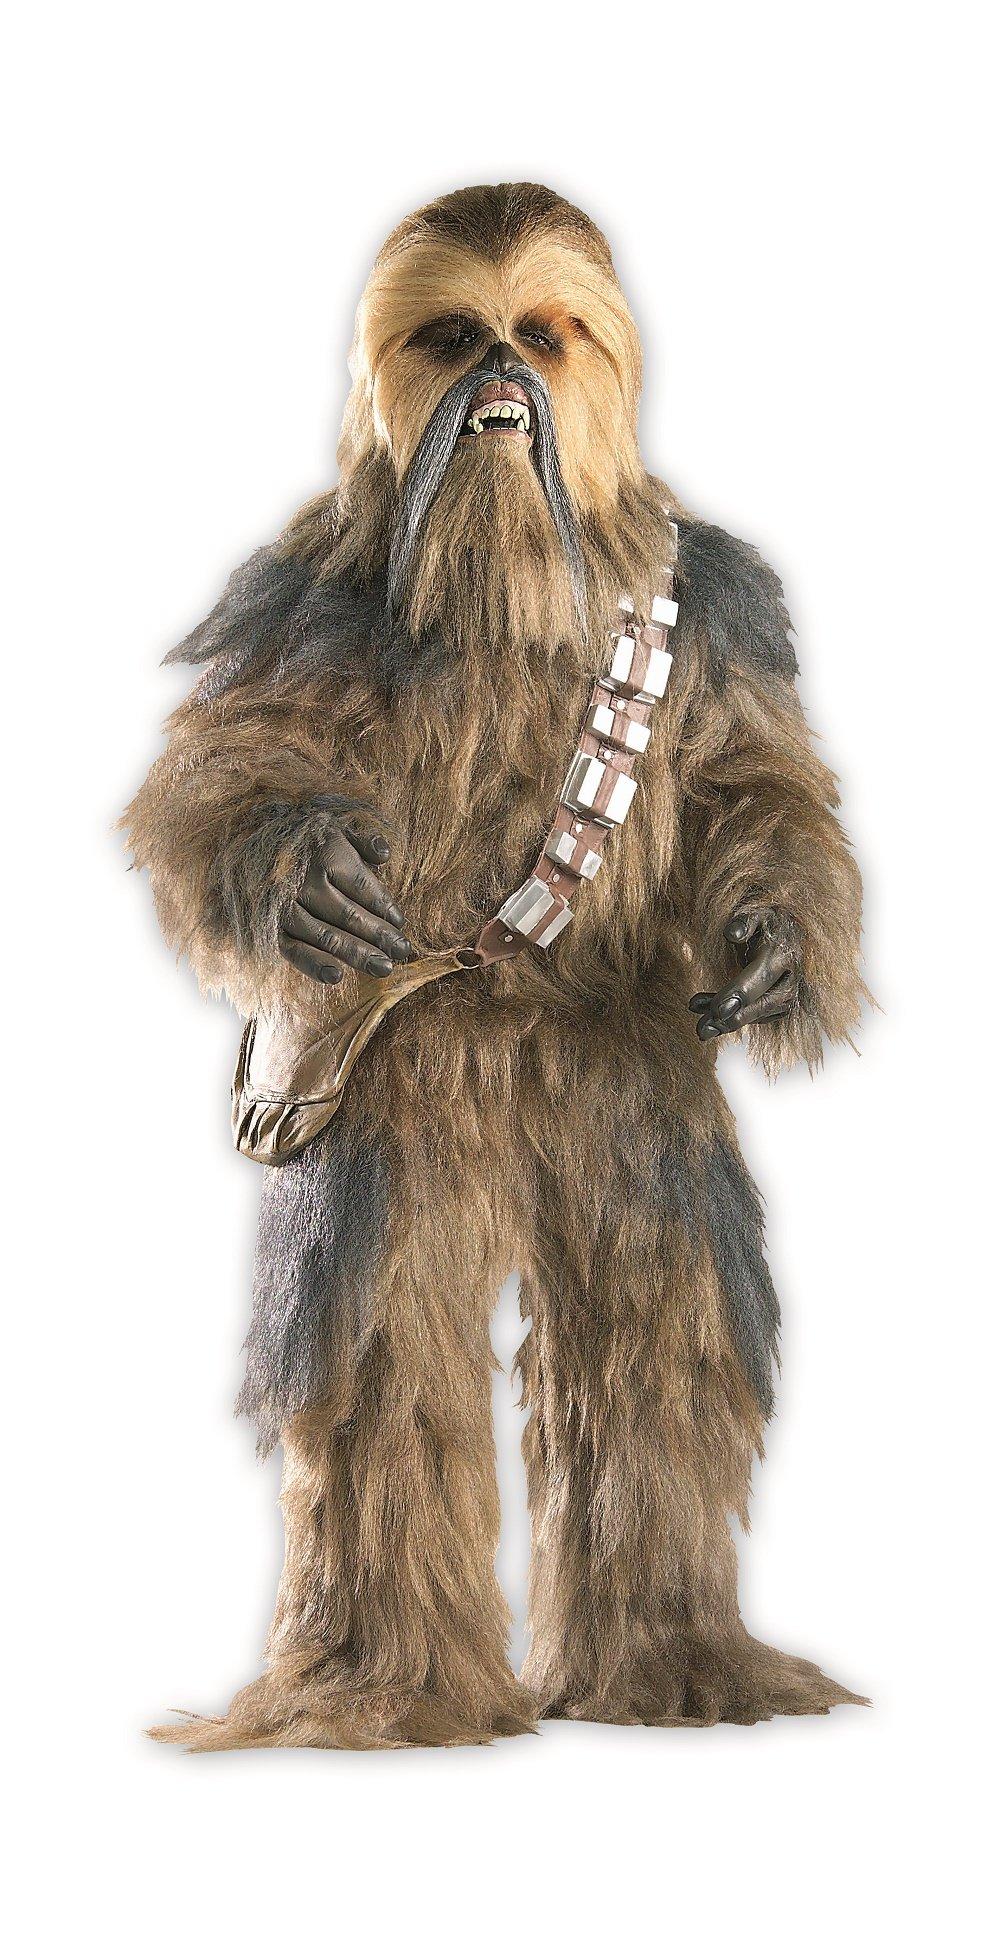 Rubie's Star Wars Collector Supreme Edition, Star Wars Episode III, Chewbacca Costume, Adult Standard